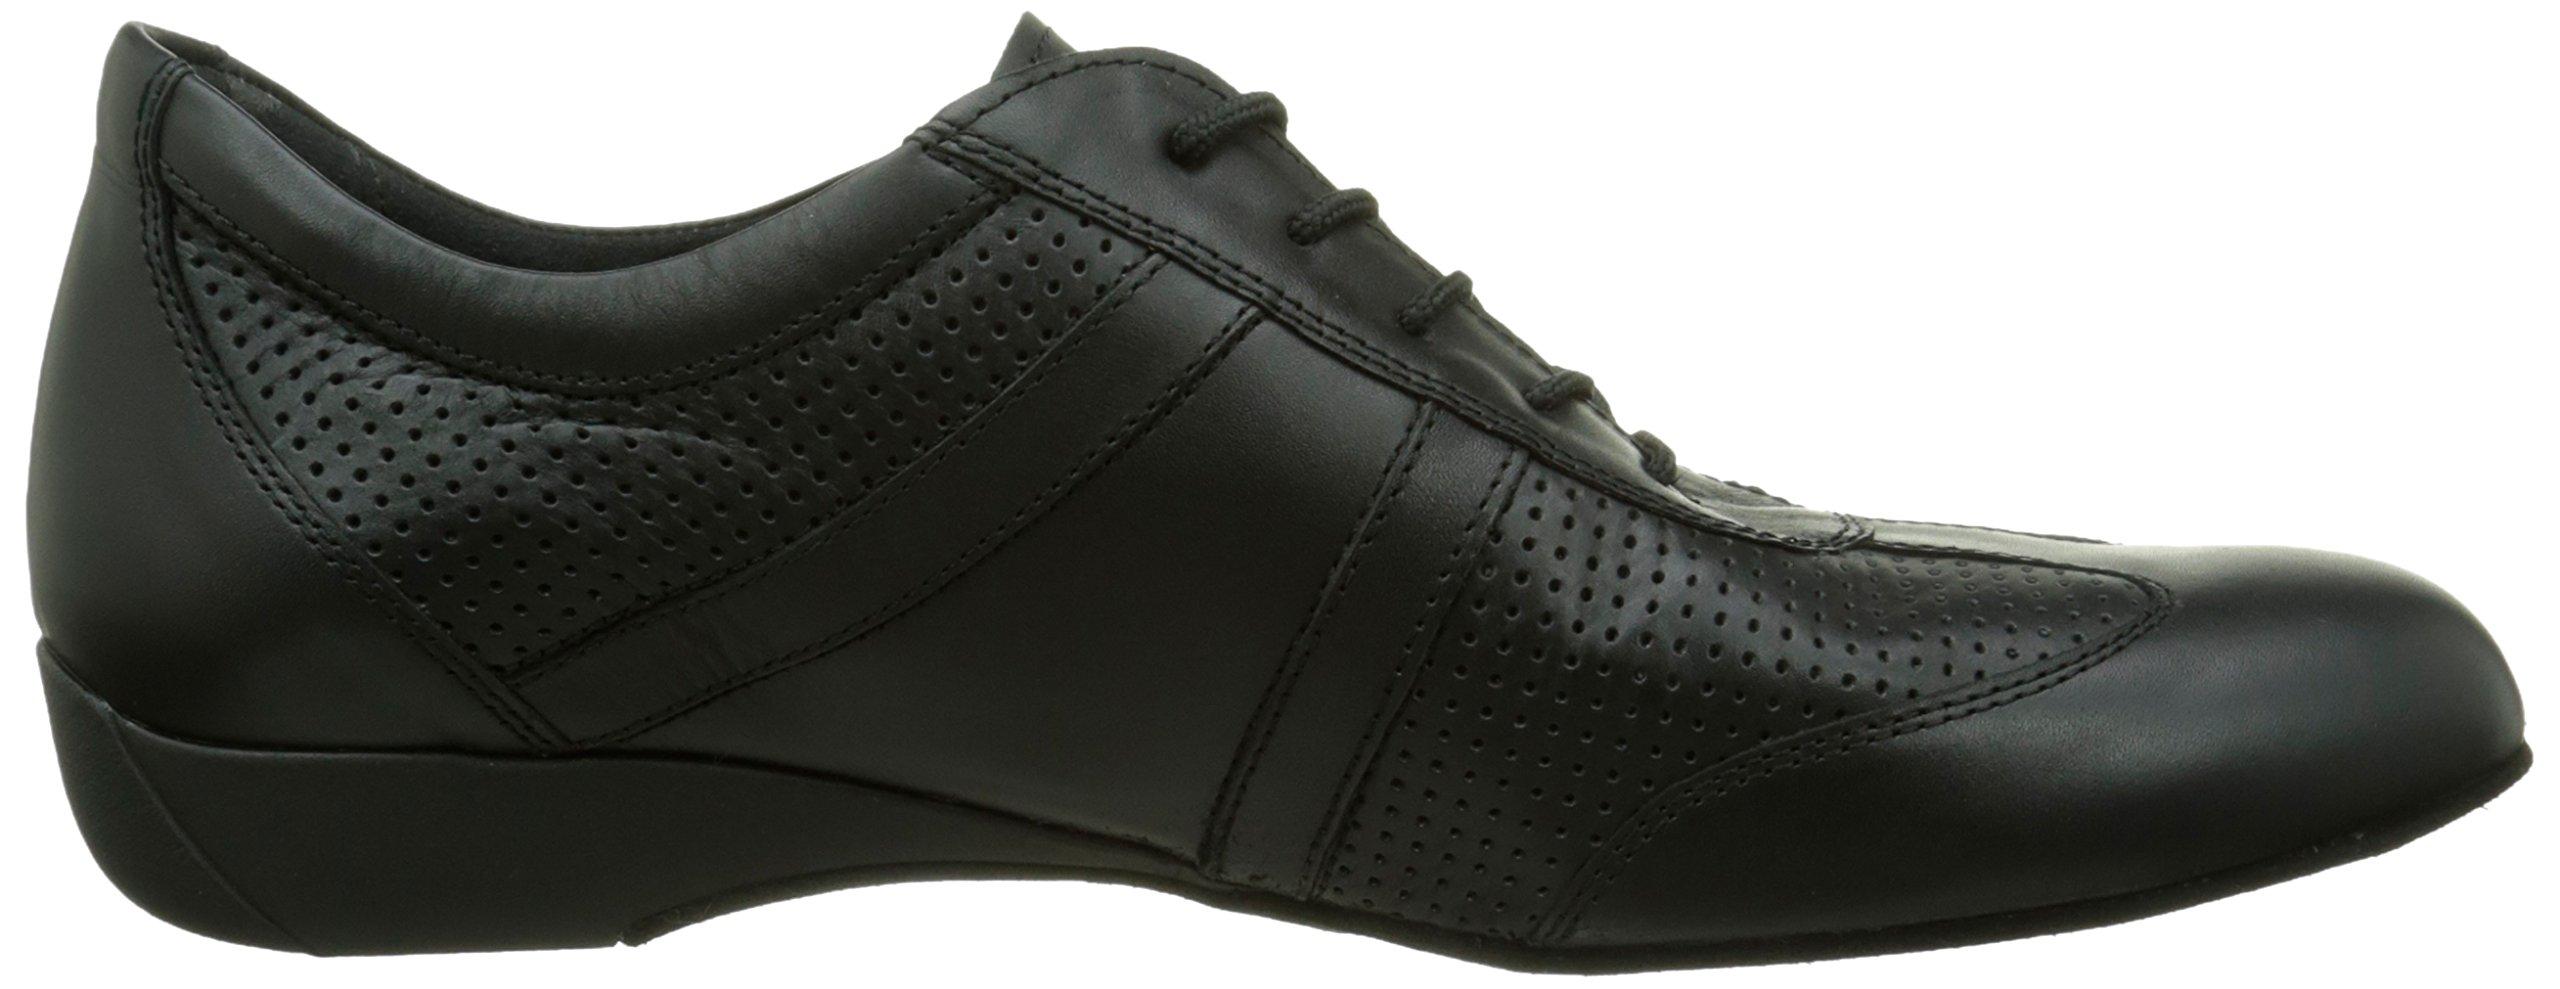 Diamant Men's Model 13 Dance Sneaker- 1'' (2.5 cm) Wedge Heel (Wide - H Width), 13.5 W US (13 UK) by Diamant (Image #6)